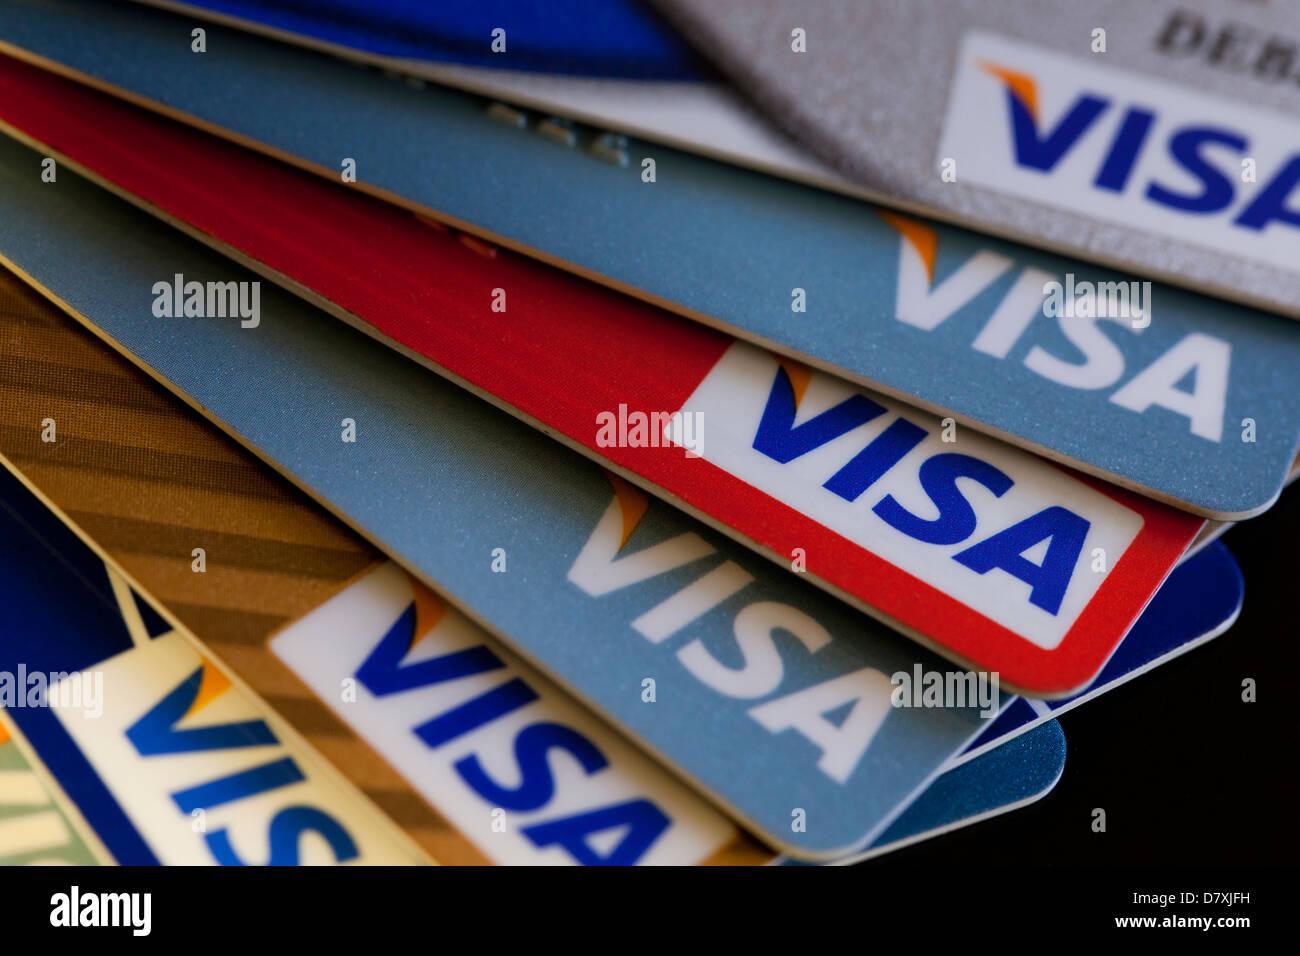 Visa credit cards - Stock Image